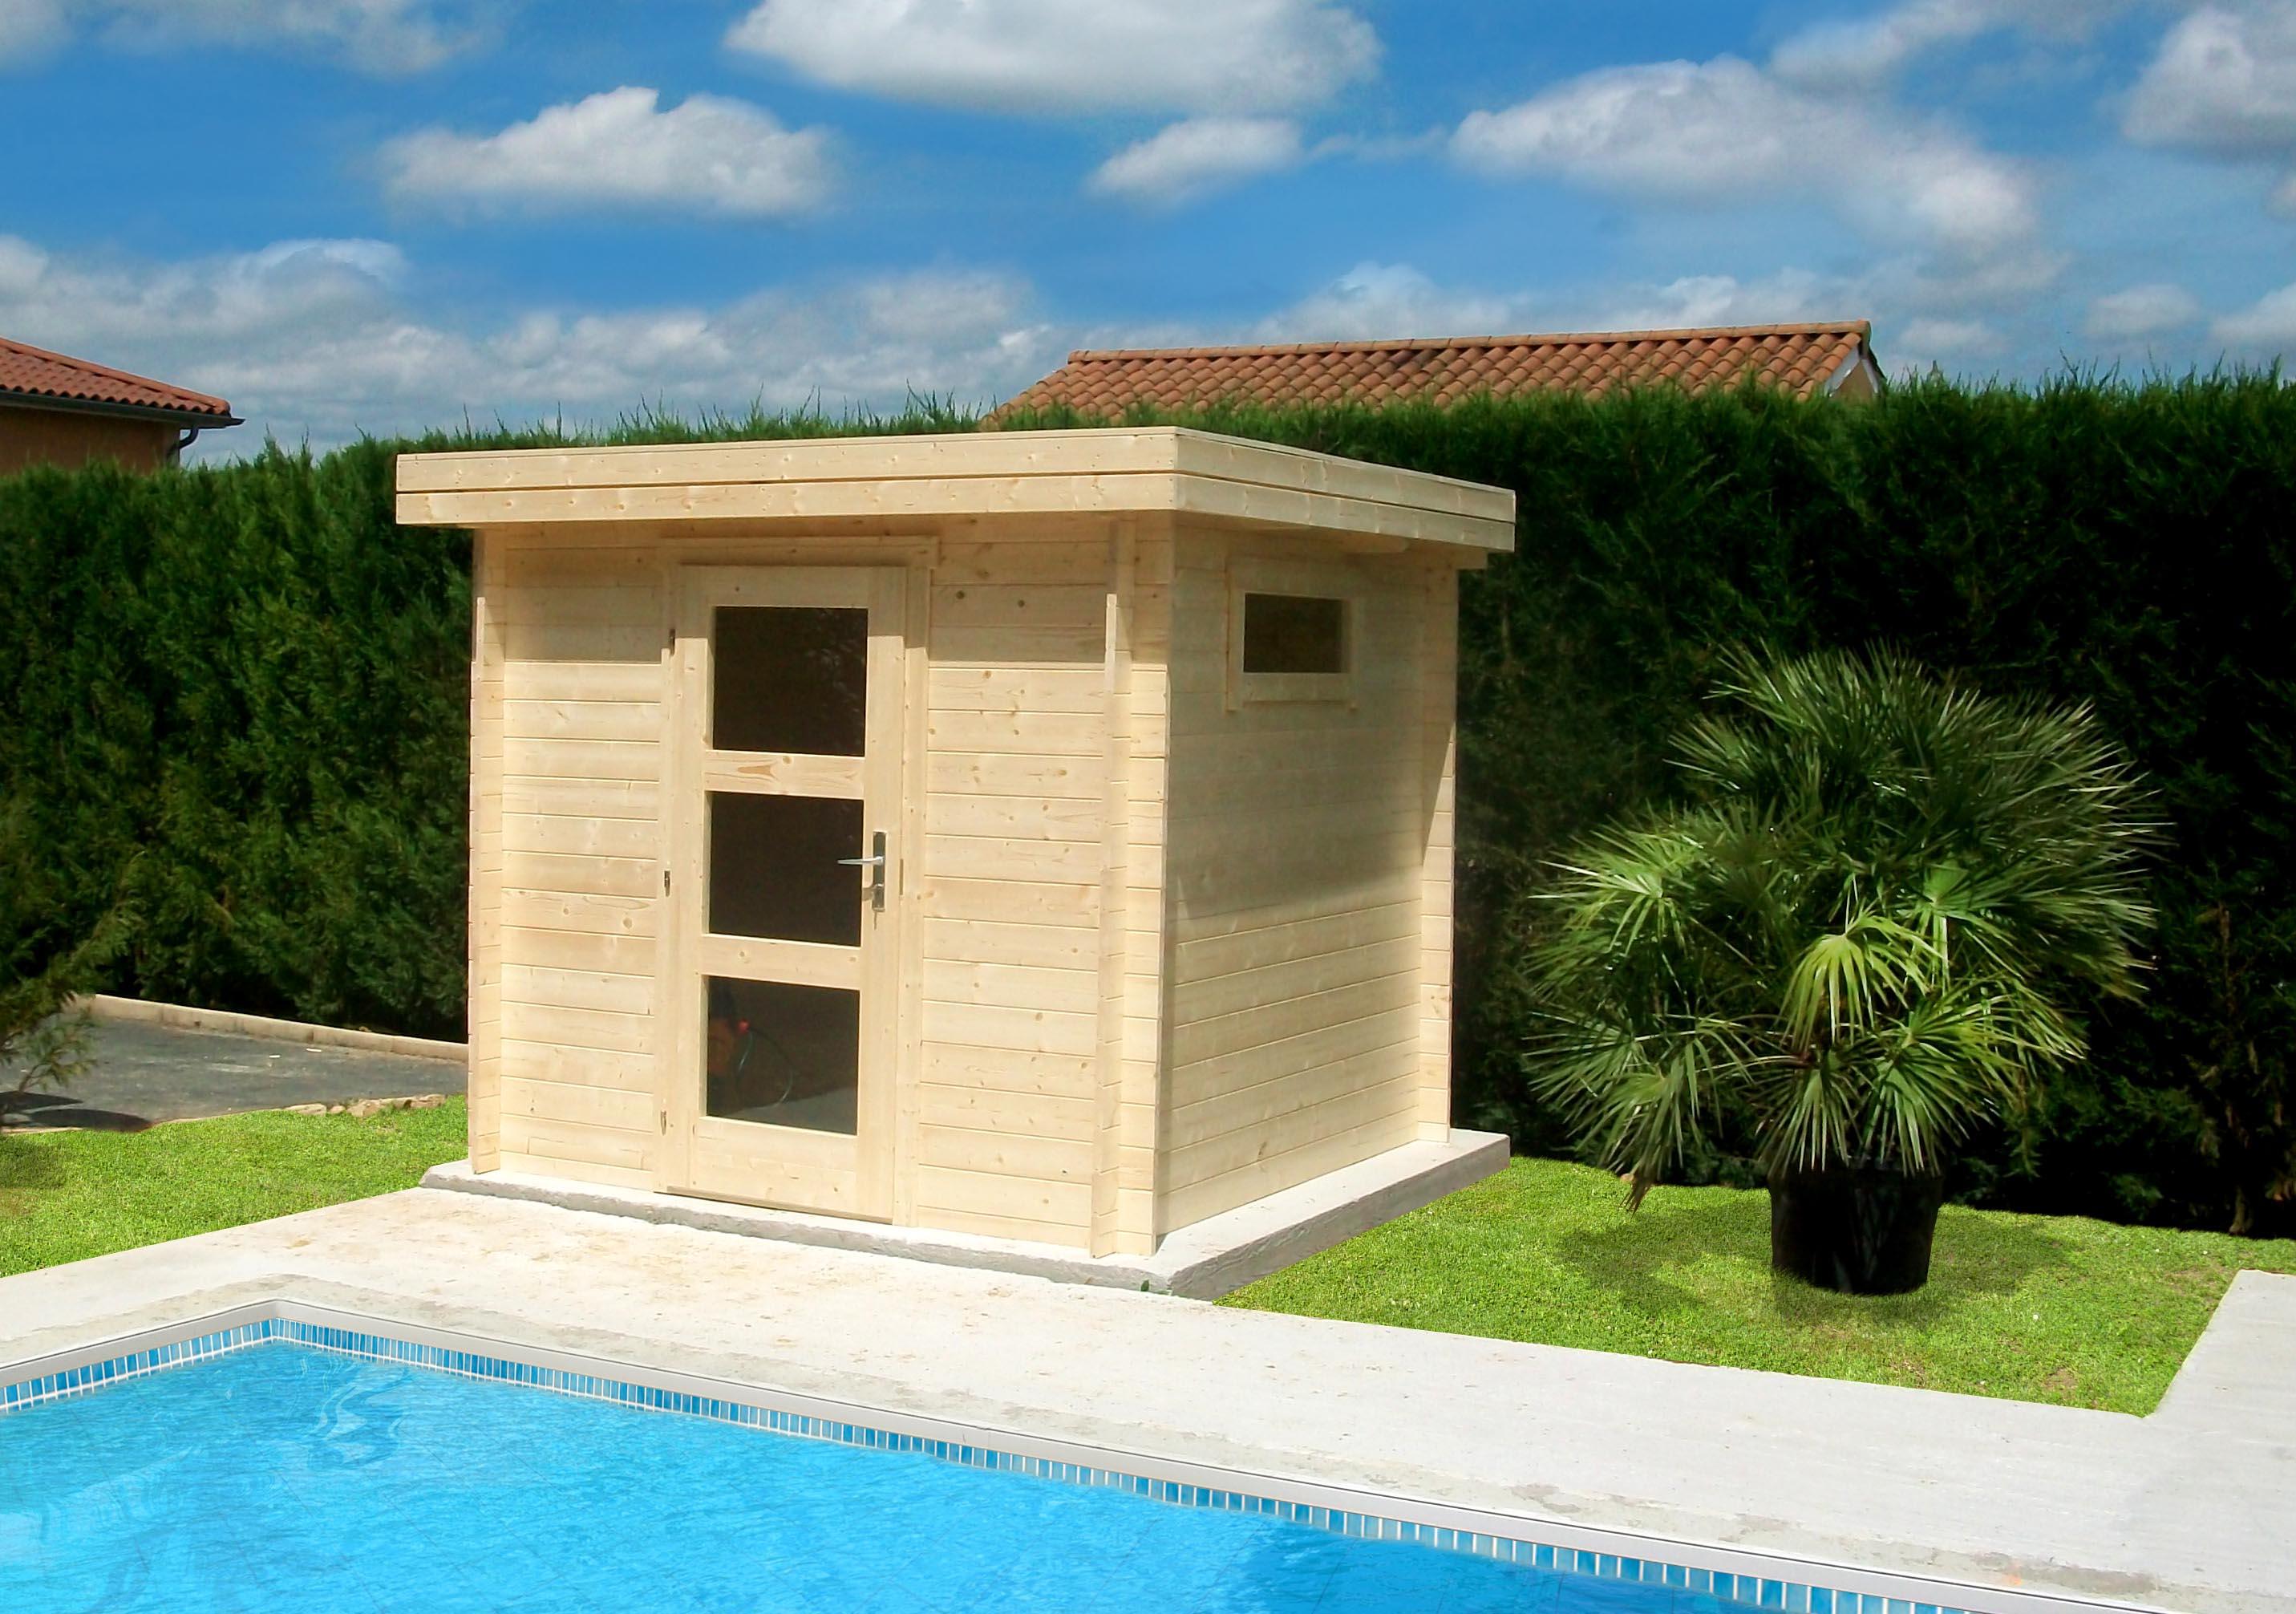 abri-de-jardin-pour-piscine